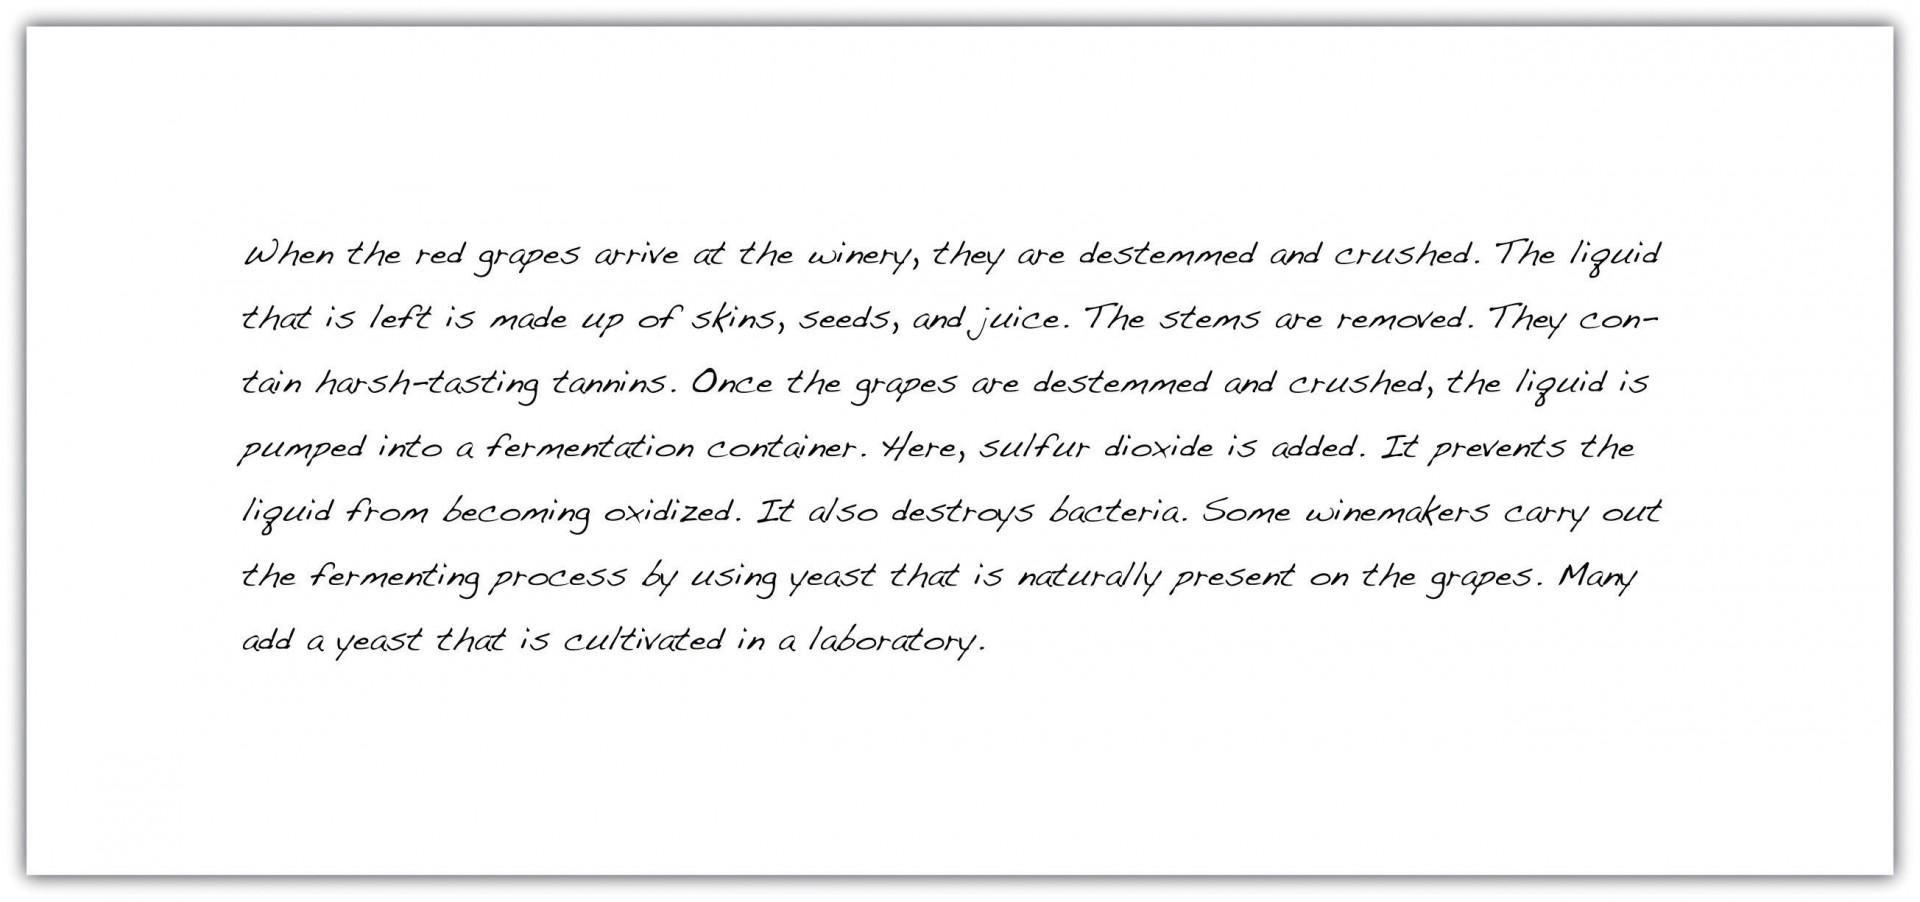 011 Essay Example Healthy Impressive Eating Topics Spm Habits Pdf 1920